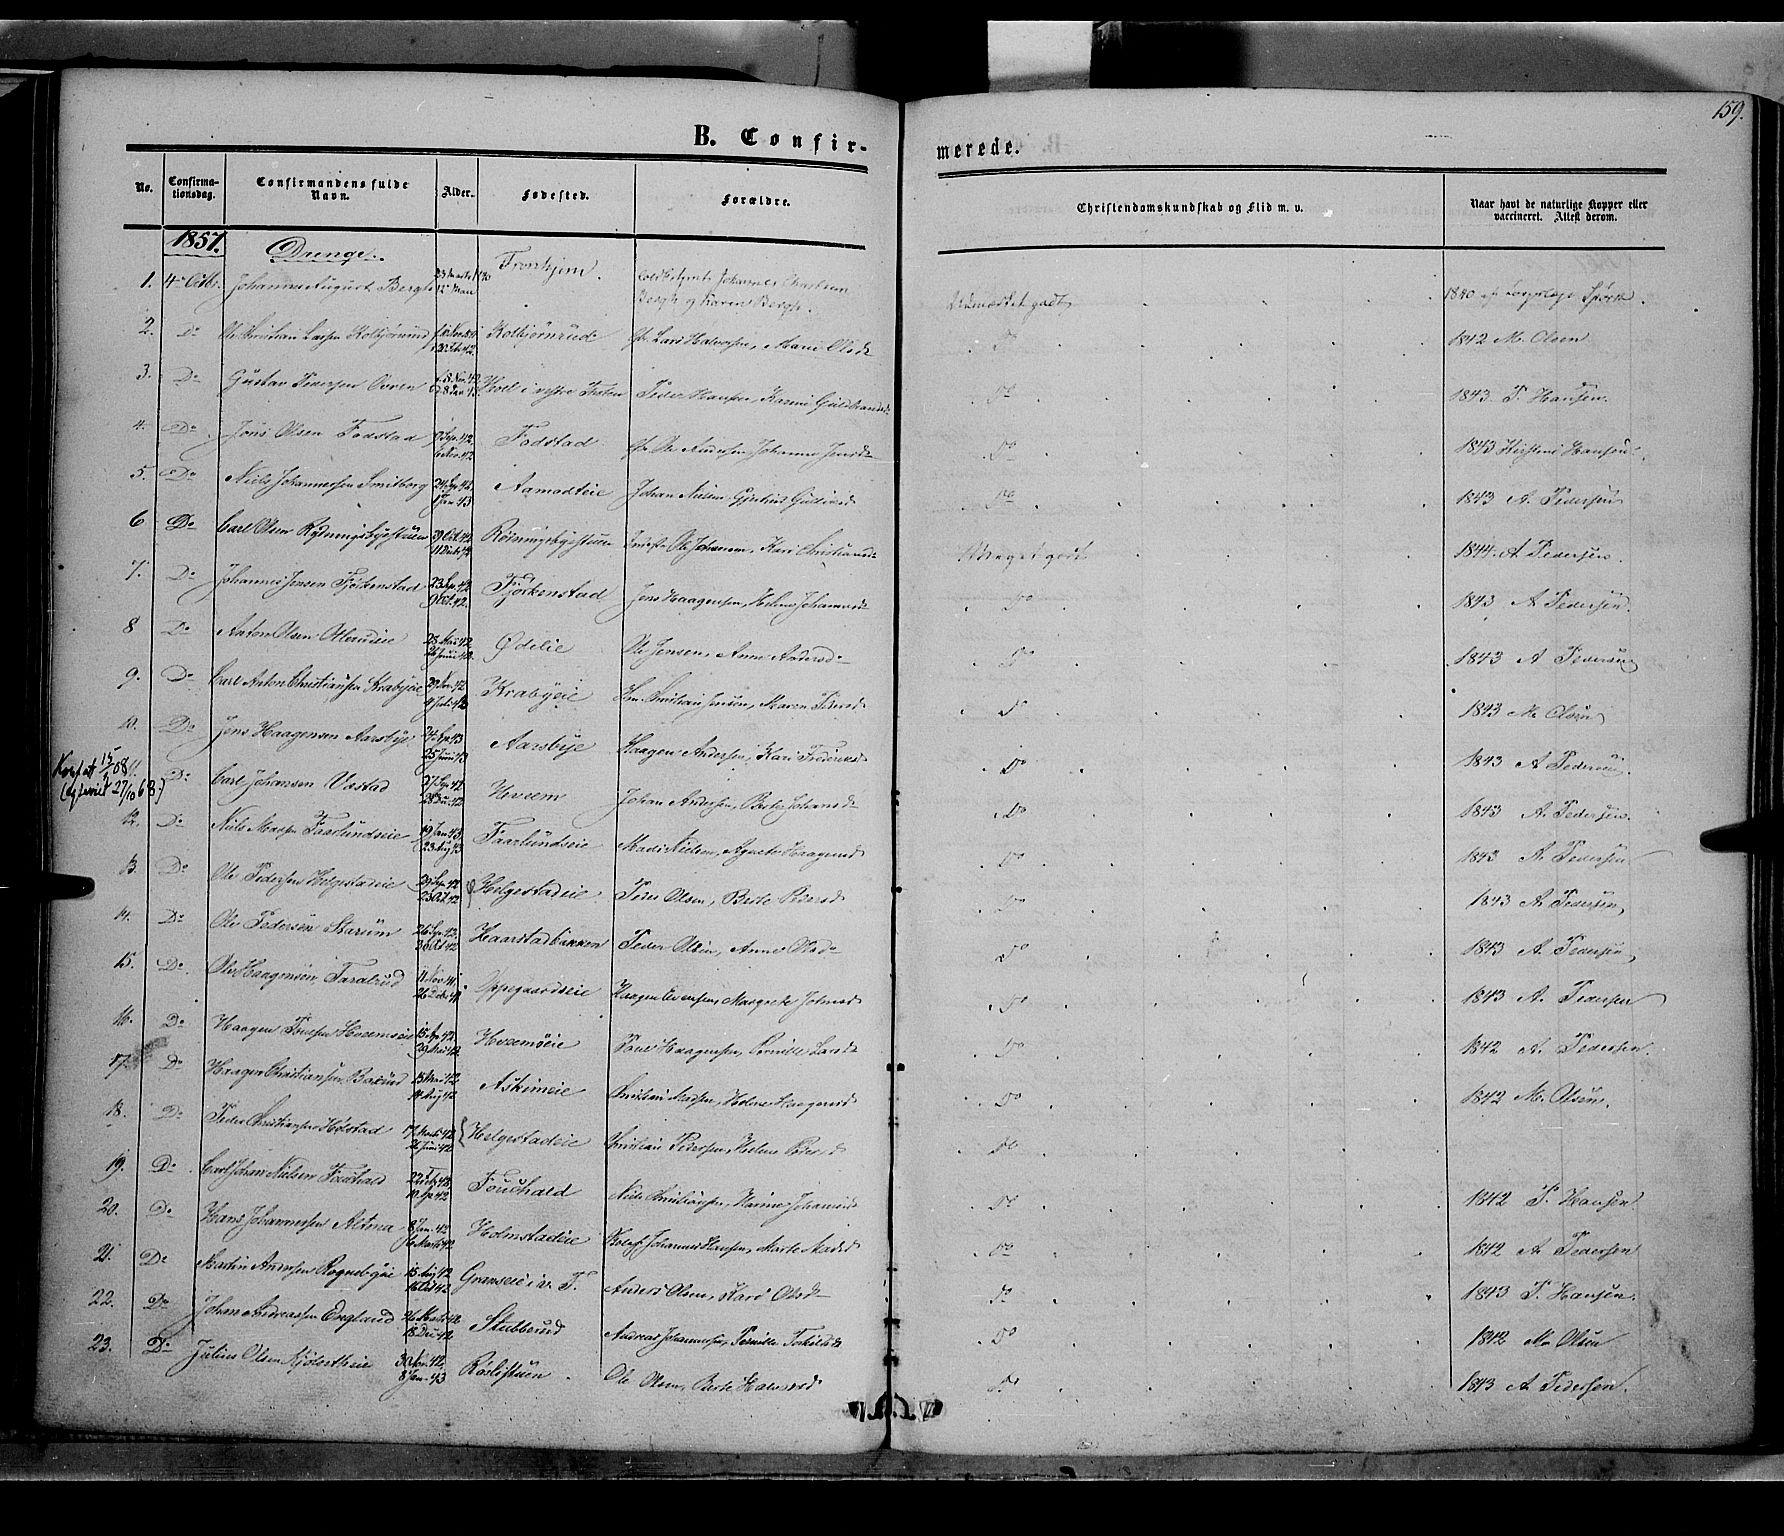 SAH, Østre Toten prestekontor, Ministerialbok nr. 4, 1857-1865, s. 159